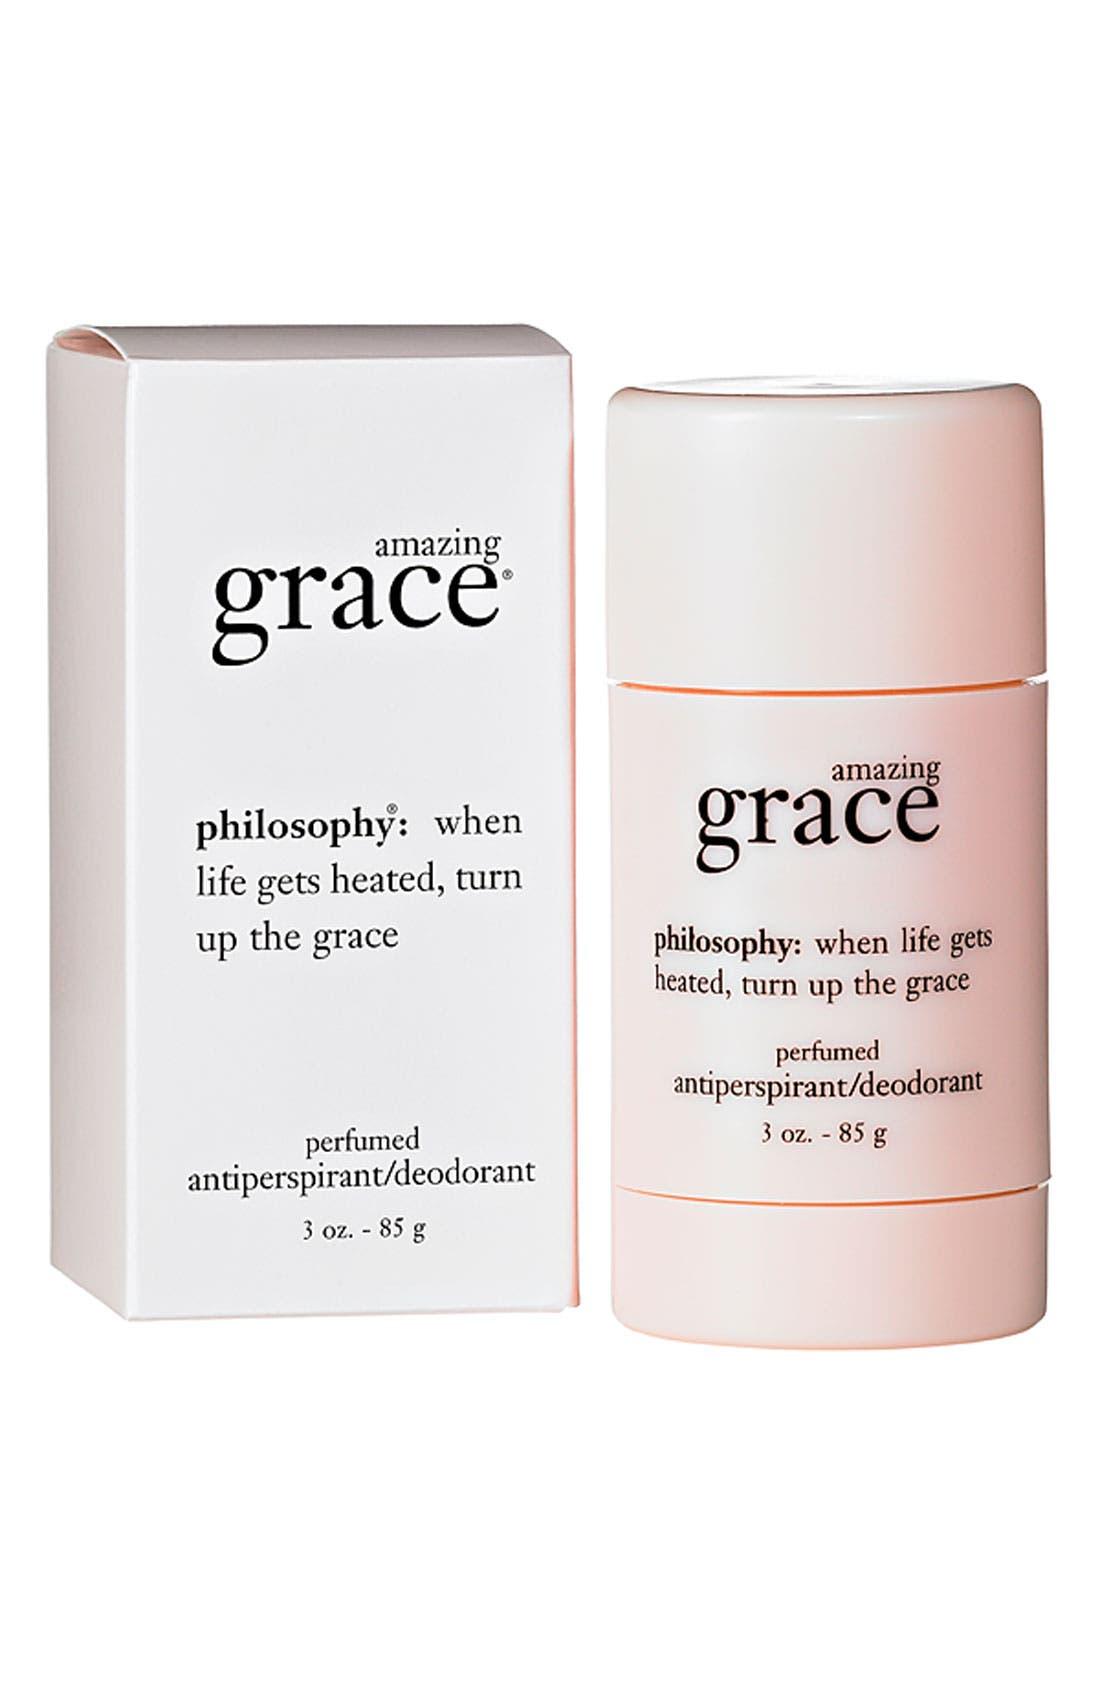 PHILOSOPHY 'amazing grace' perfumed antiperspirant/deodorant, Main, color, 000